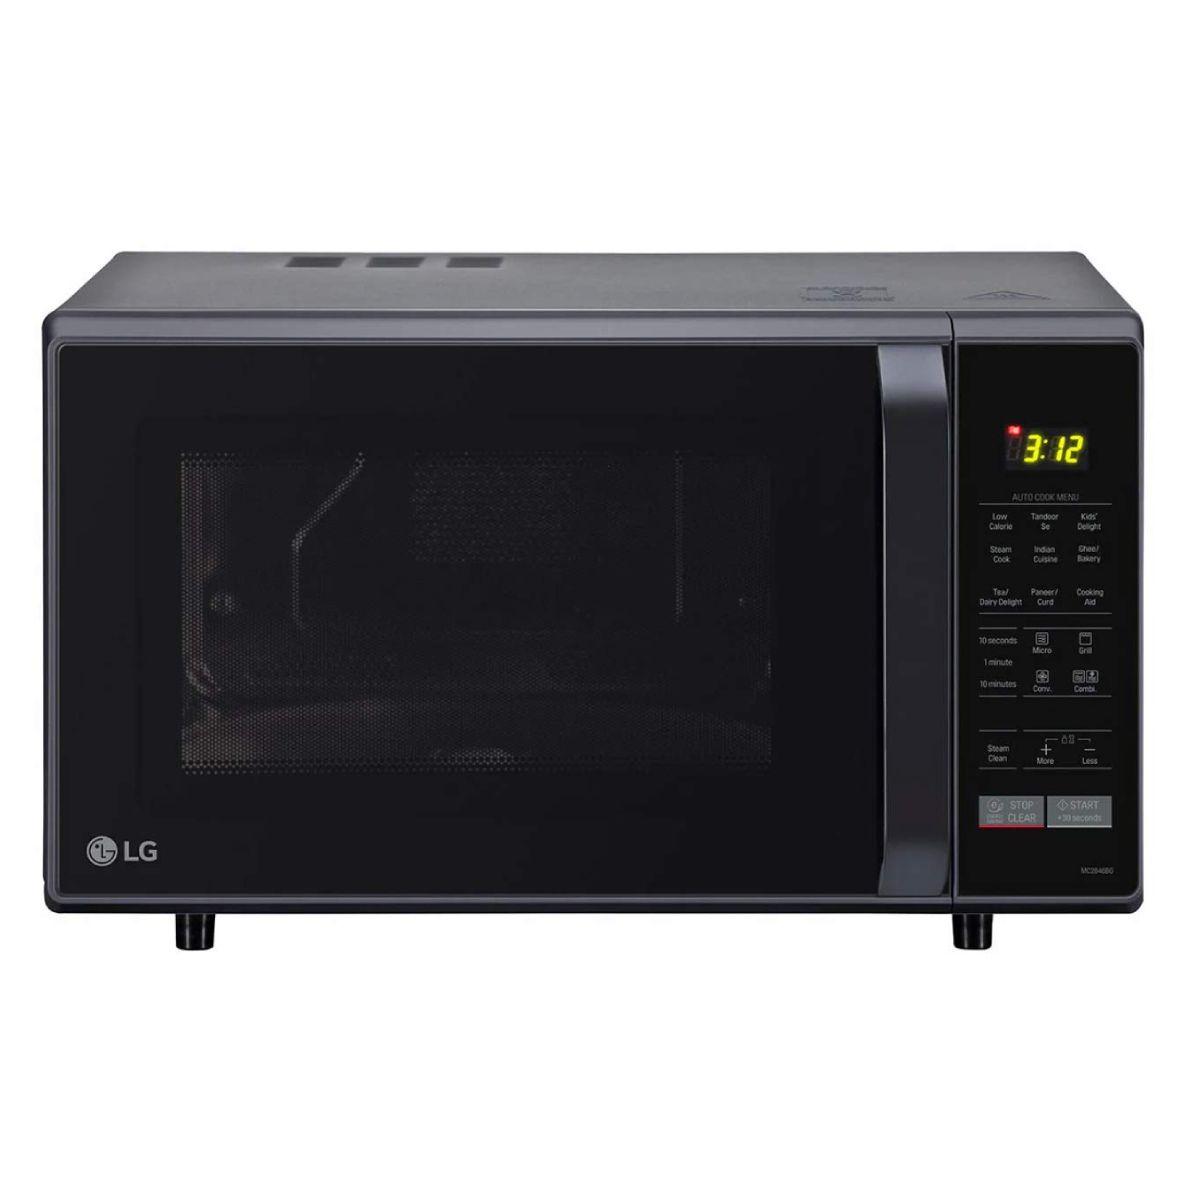 LG 28 L Convection Microwave Oven (MC2846BG)